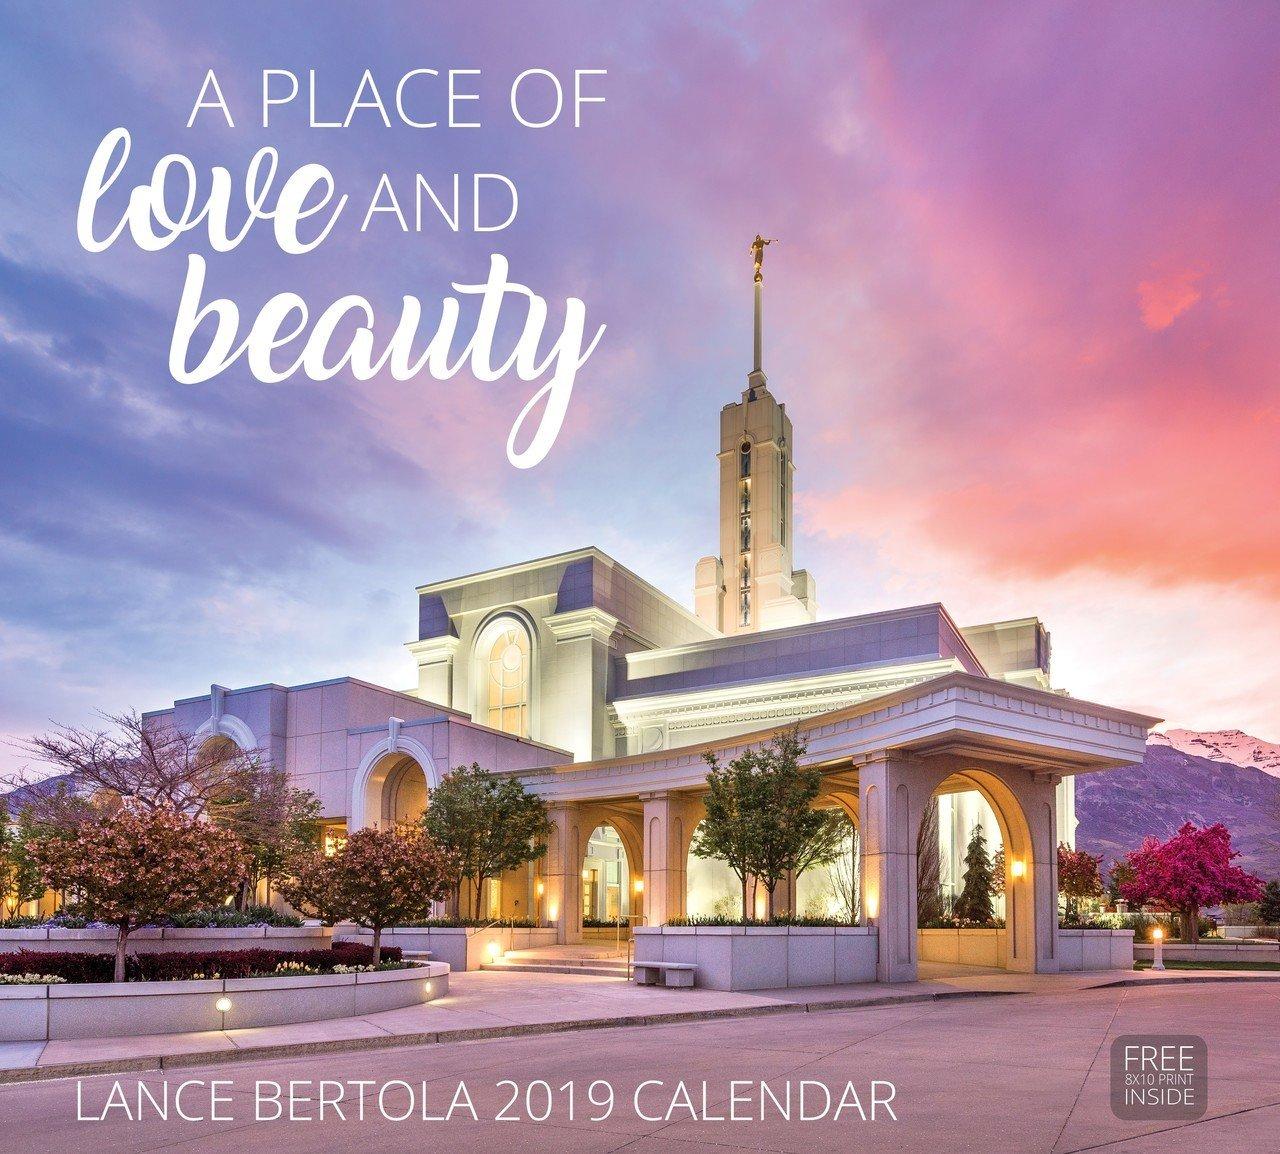 2019 Lance Bertola Calendar - A Place of Love & Beauty